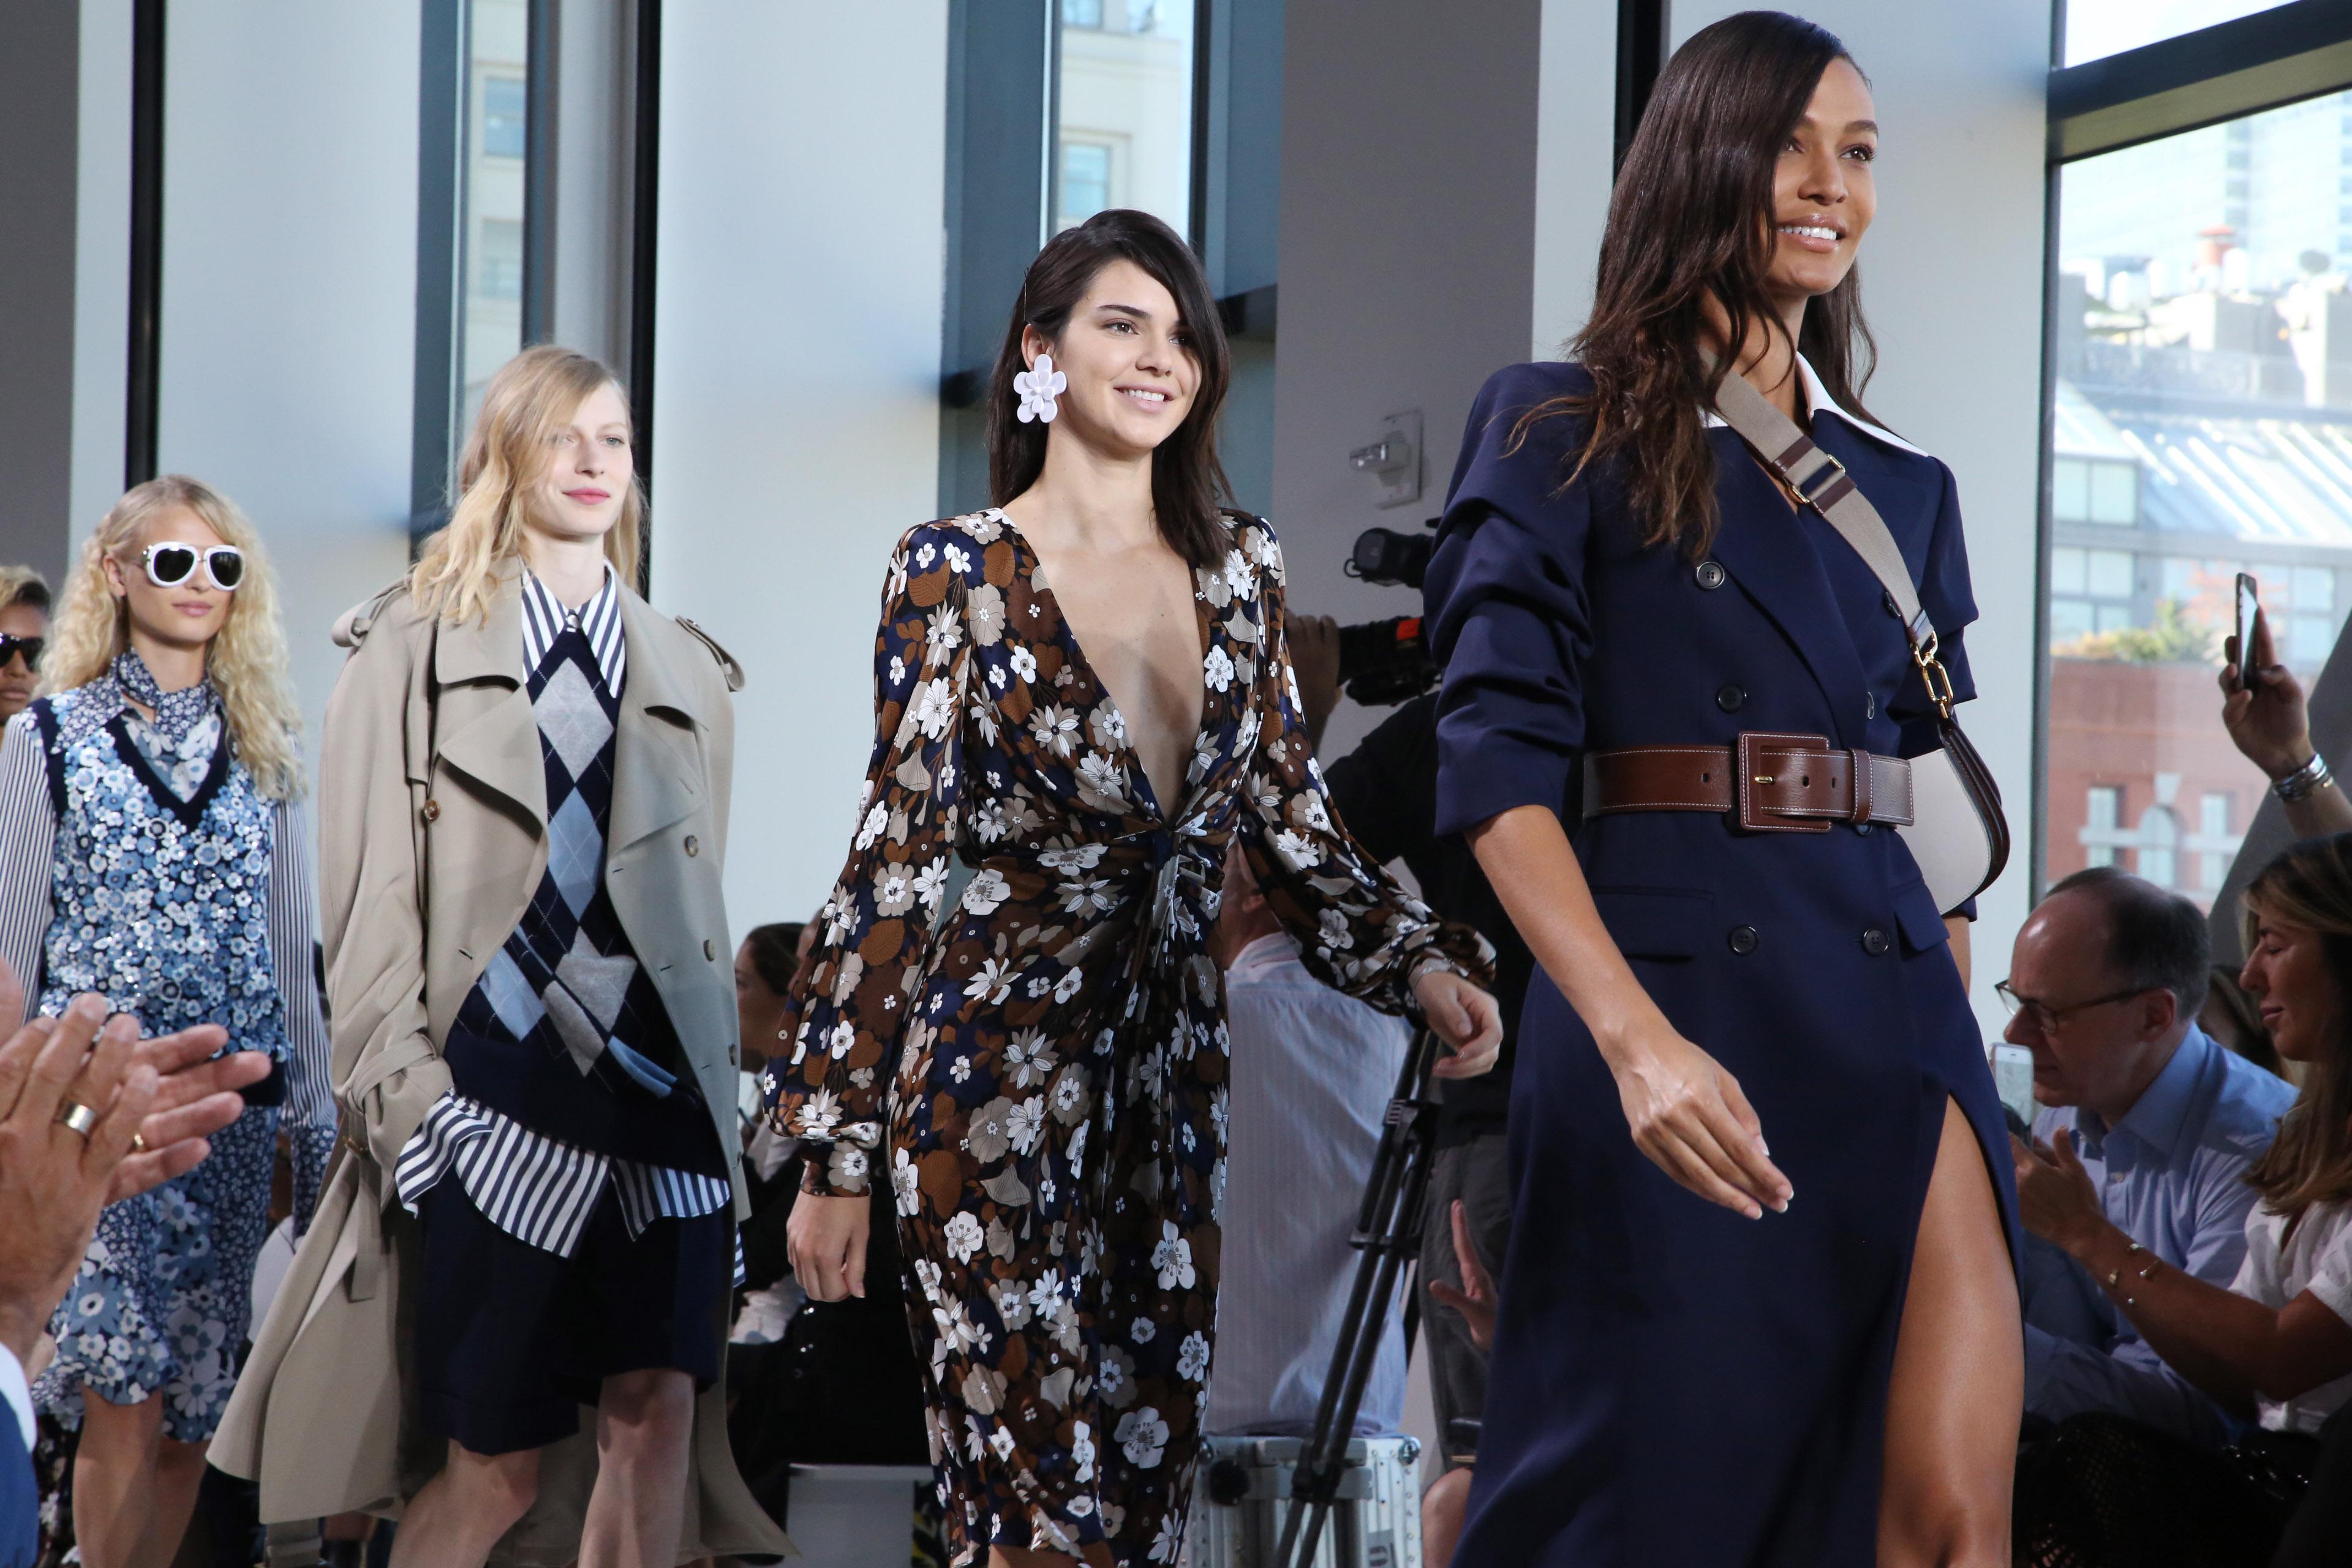 Michael Kors show, Spring Summer 2017, New York Fashion Week, USA - 14 Sep 2016